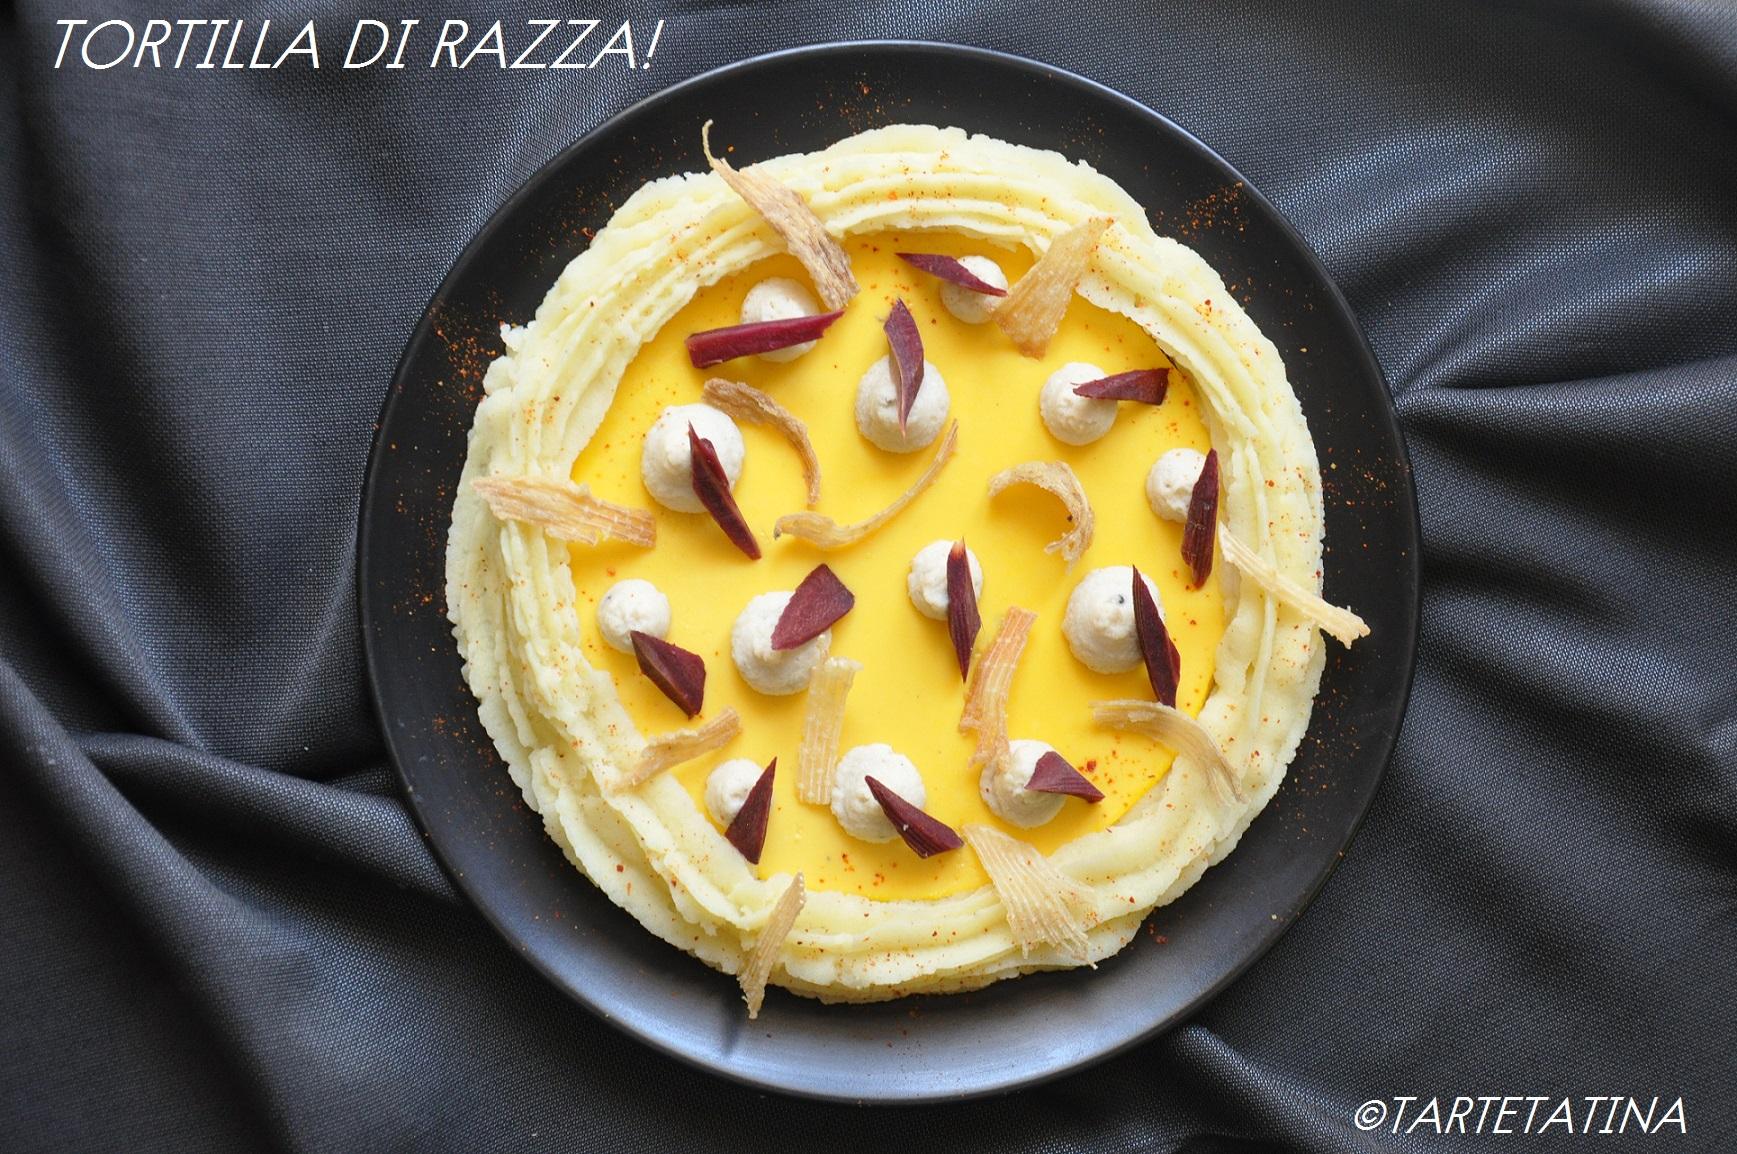 Tortilla di razza! Tortilla creativa per #MTC72